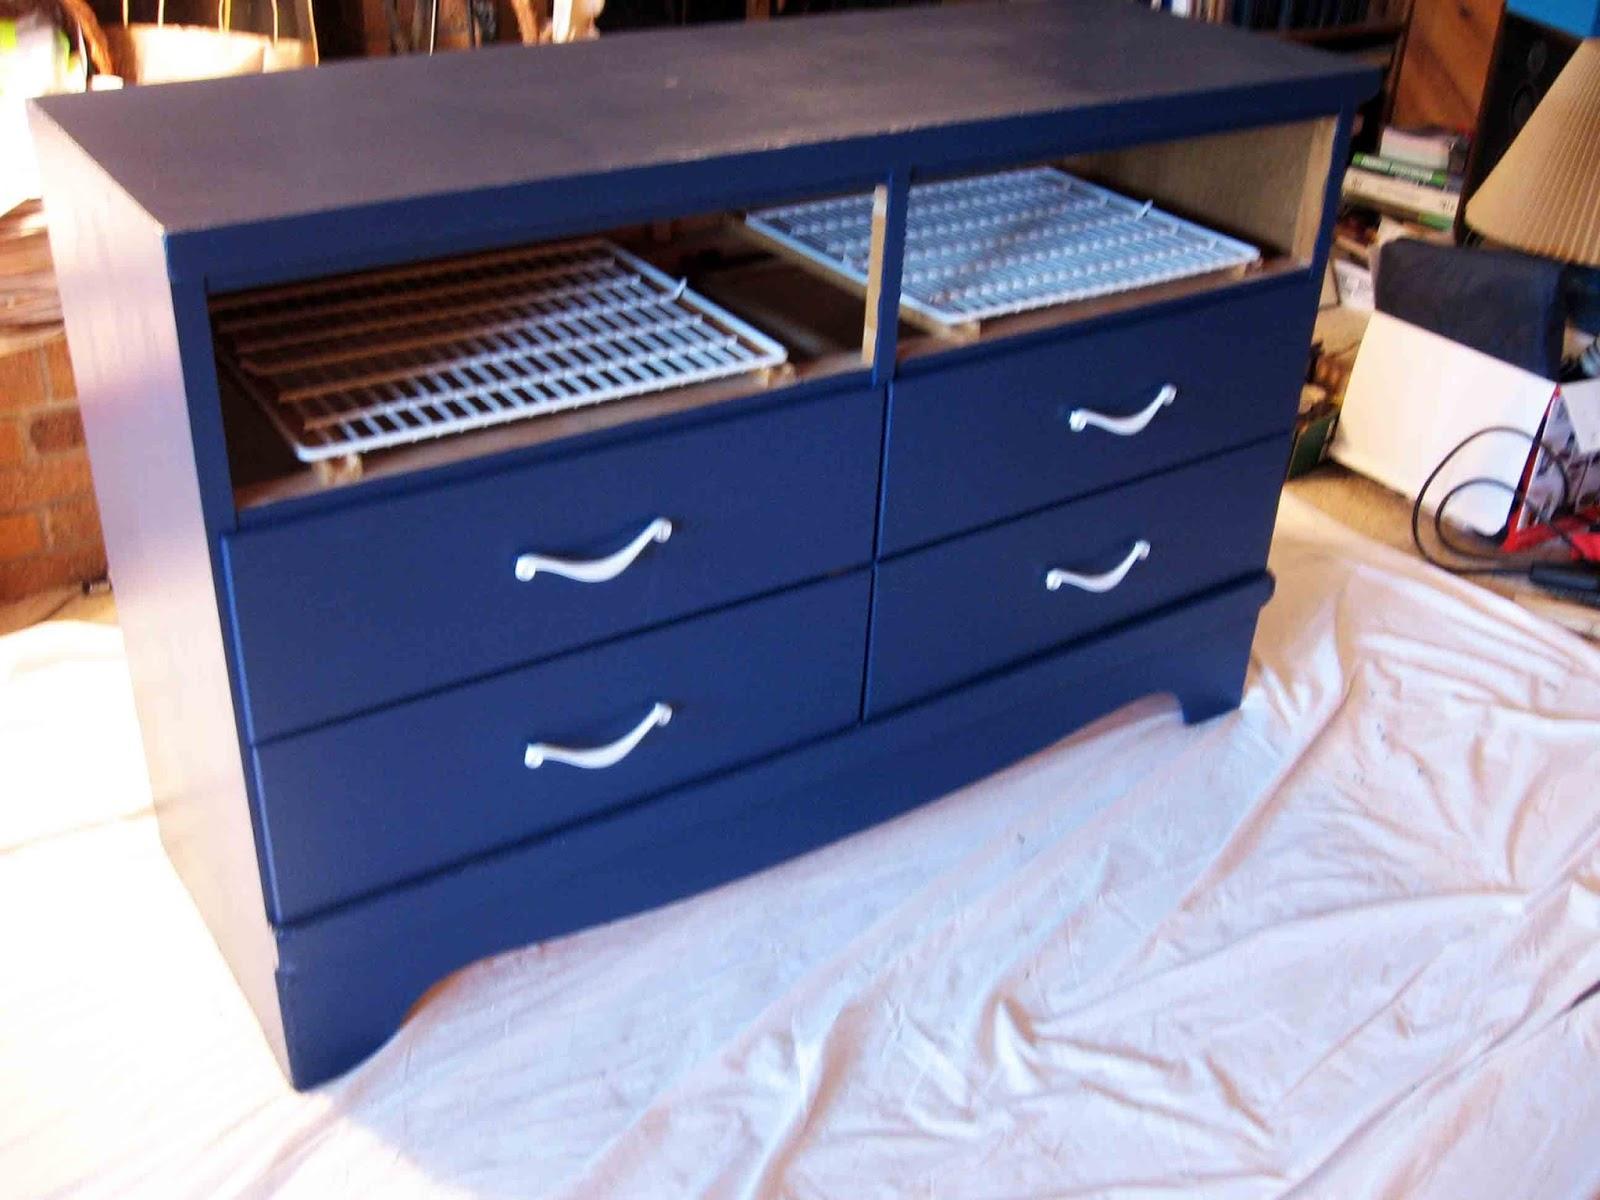 Thumper's Burrow: DIY TV Stand Dresser Make-over